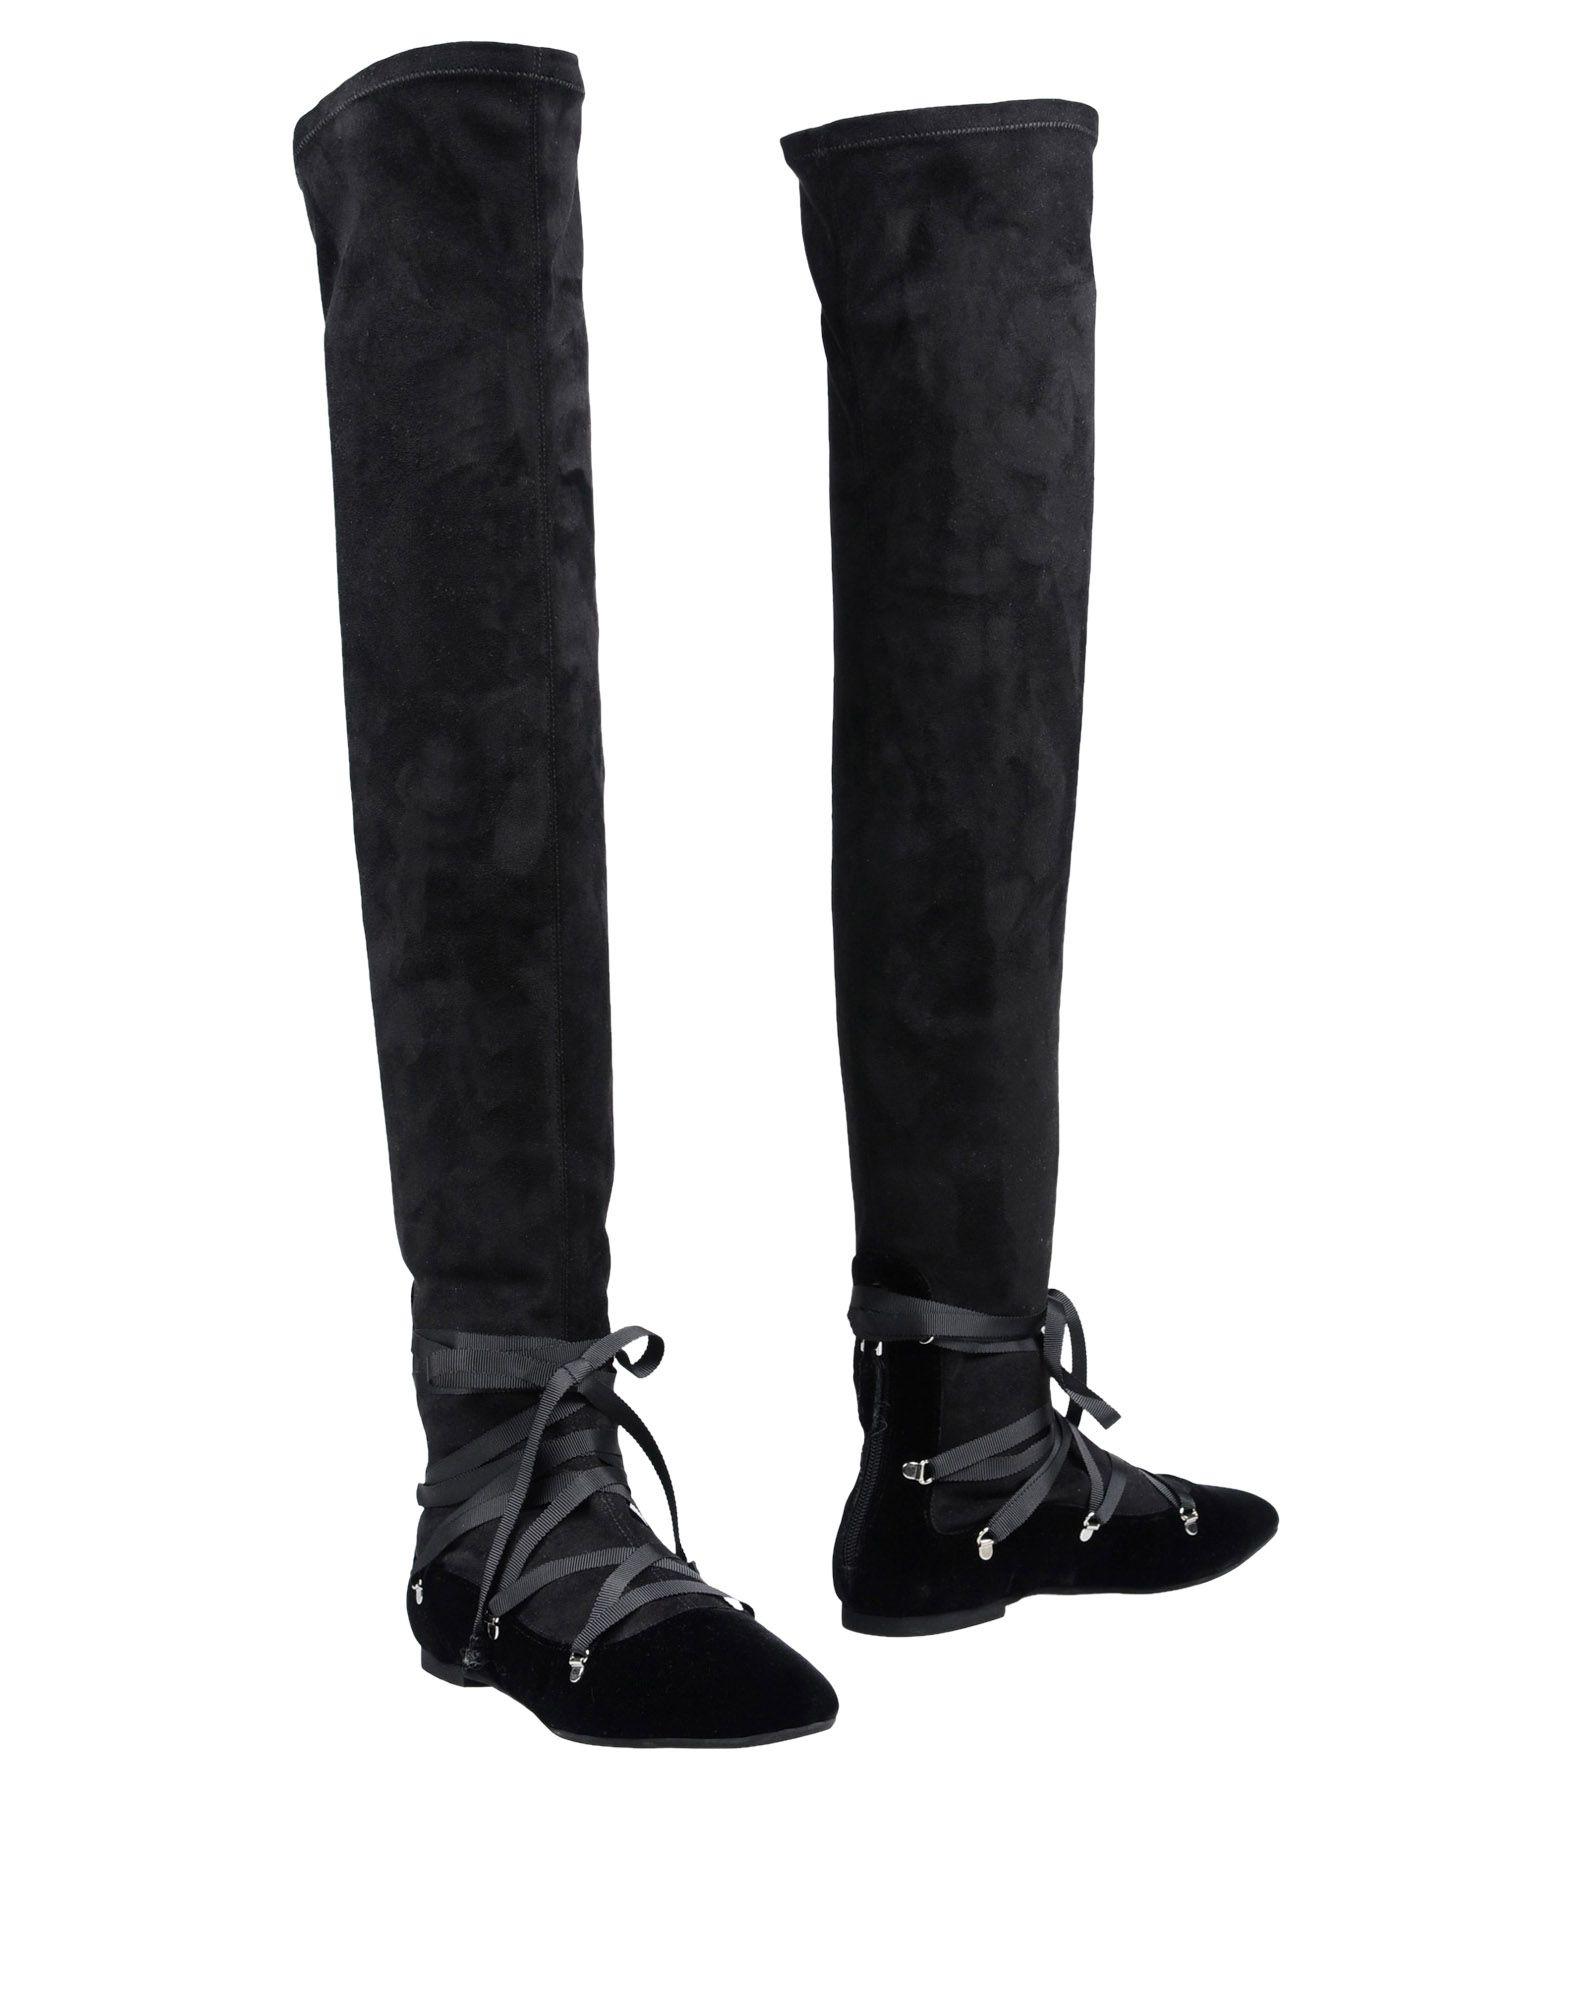 Moda Stivali Kallistè Donna - 11460383WS